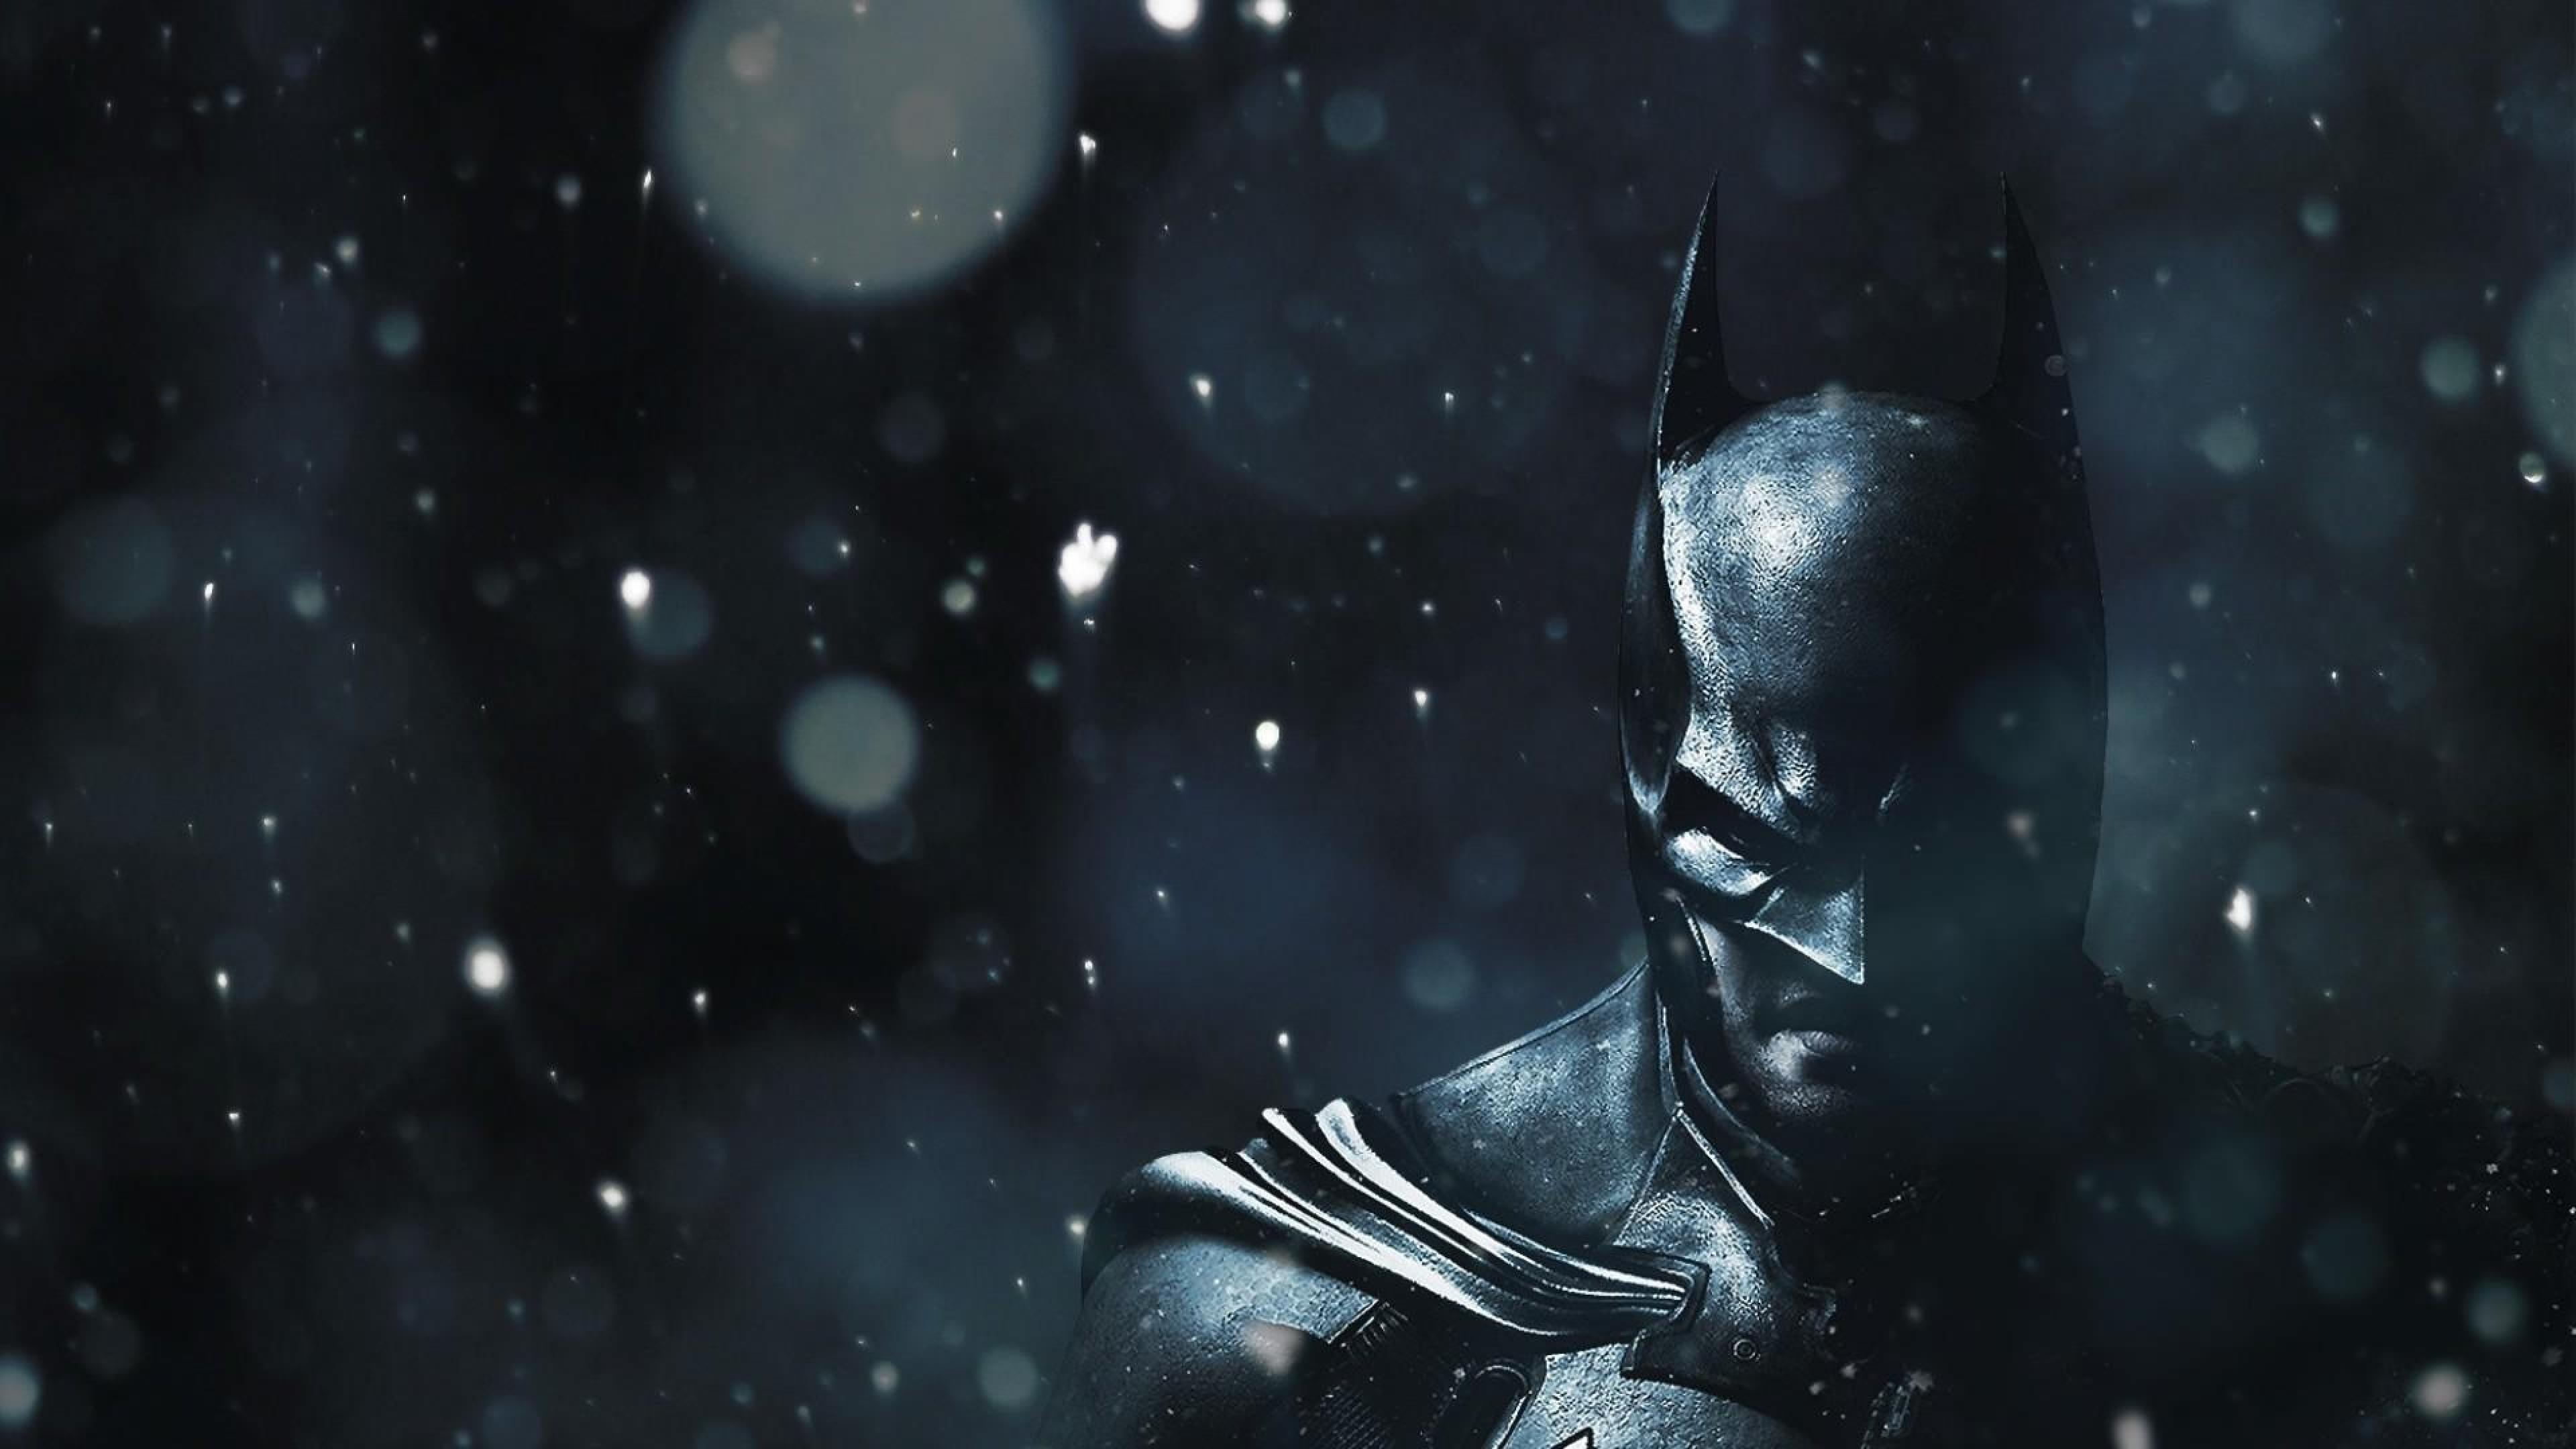 Batman HD Wallpapers, Desktop Backgrounds, Mobile Wallpapers .